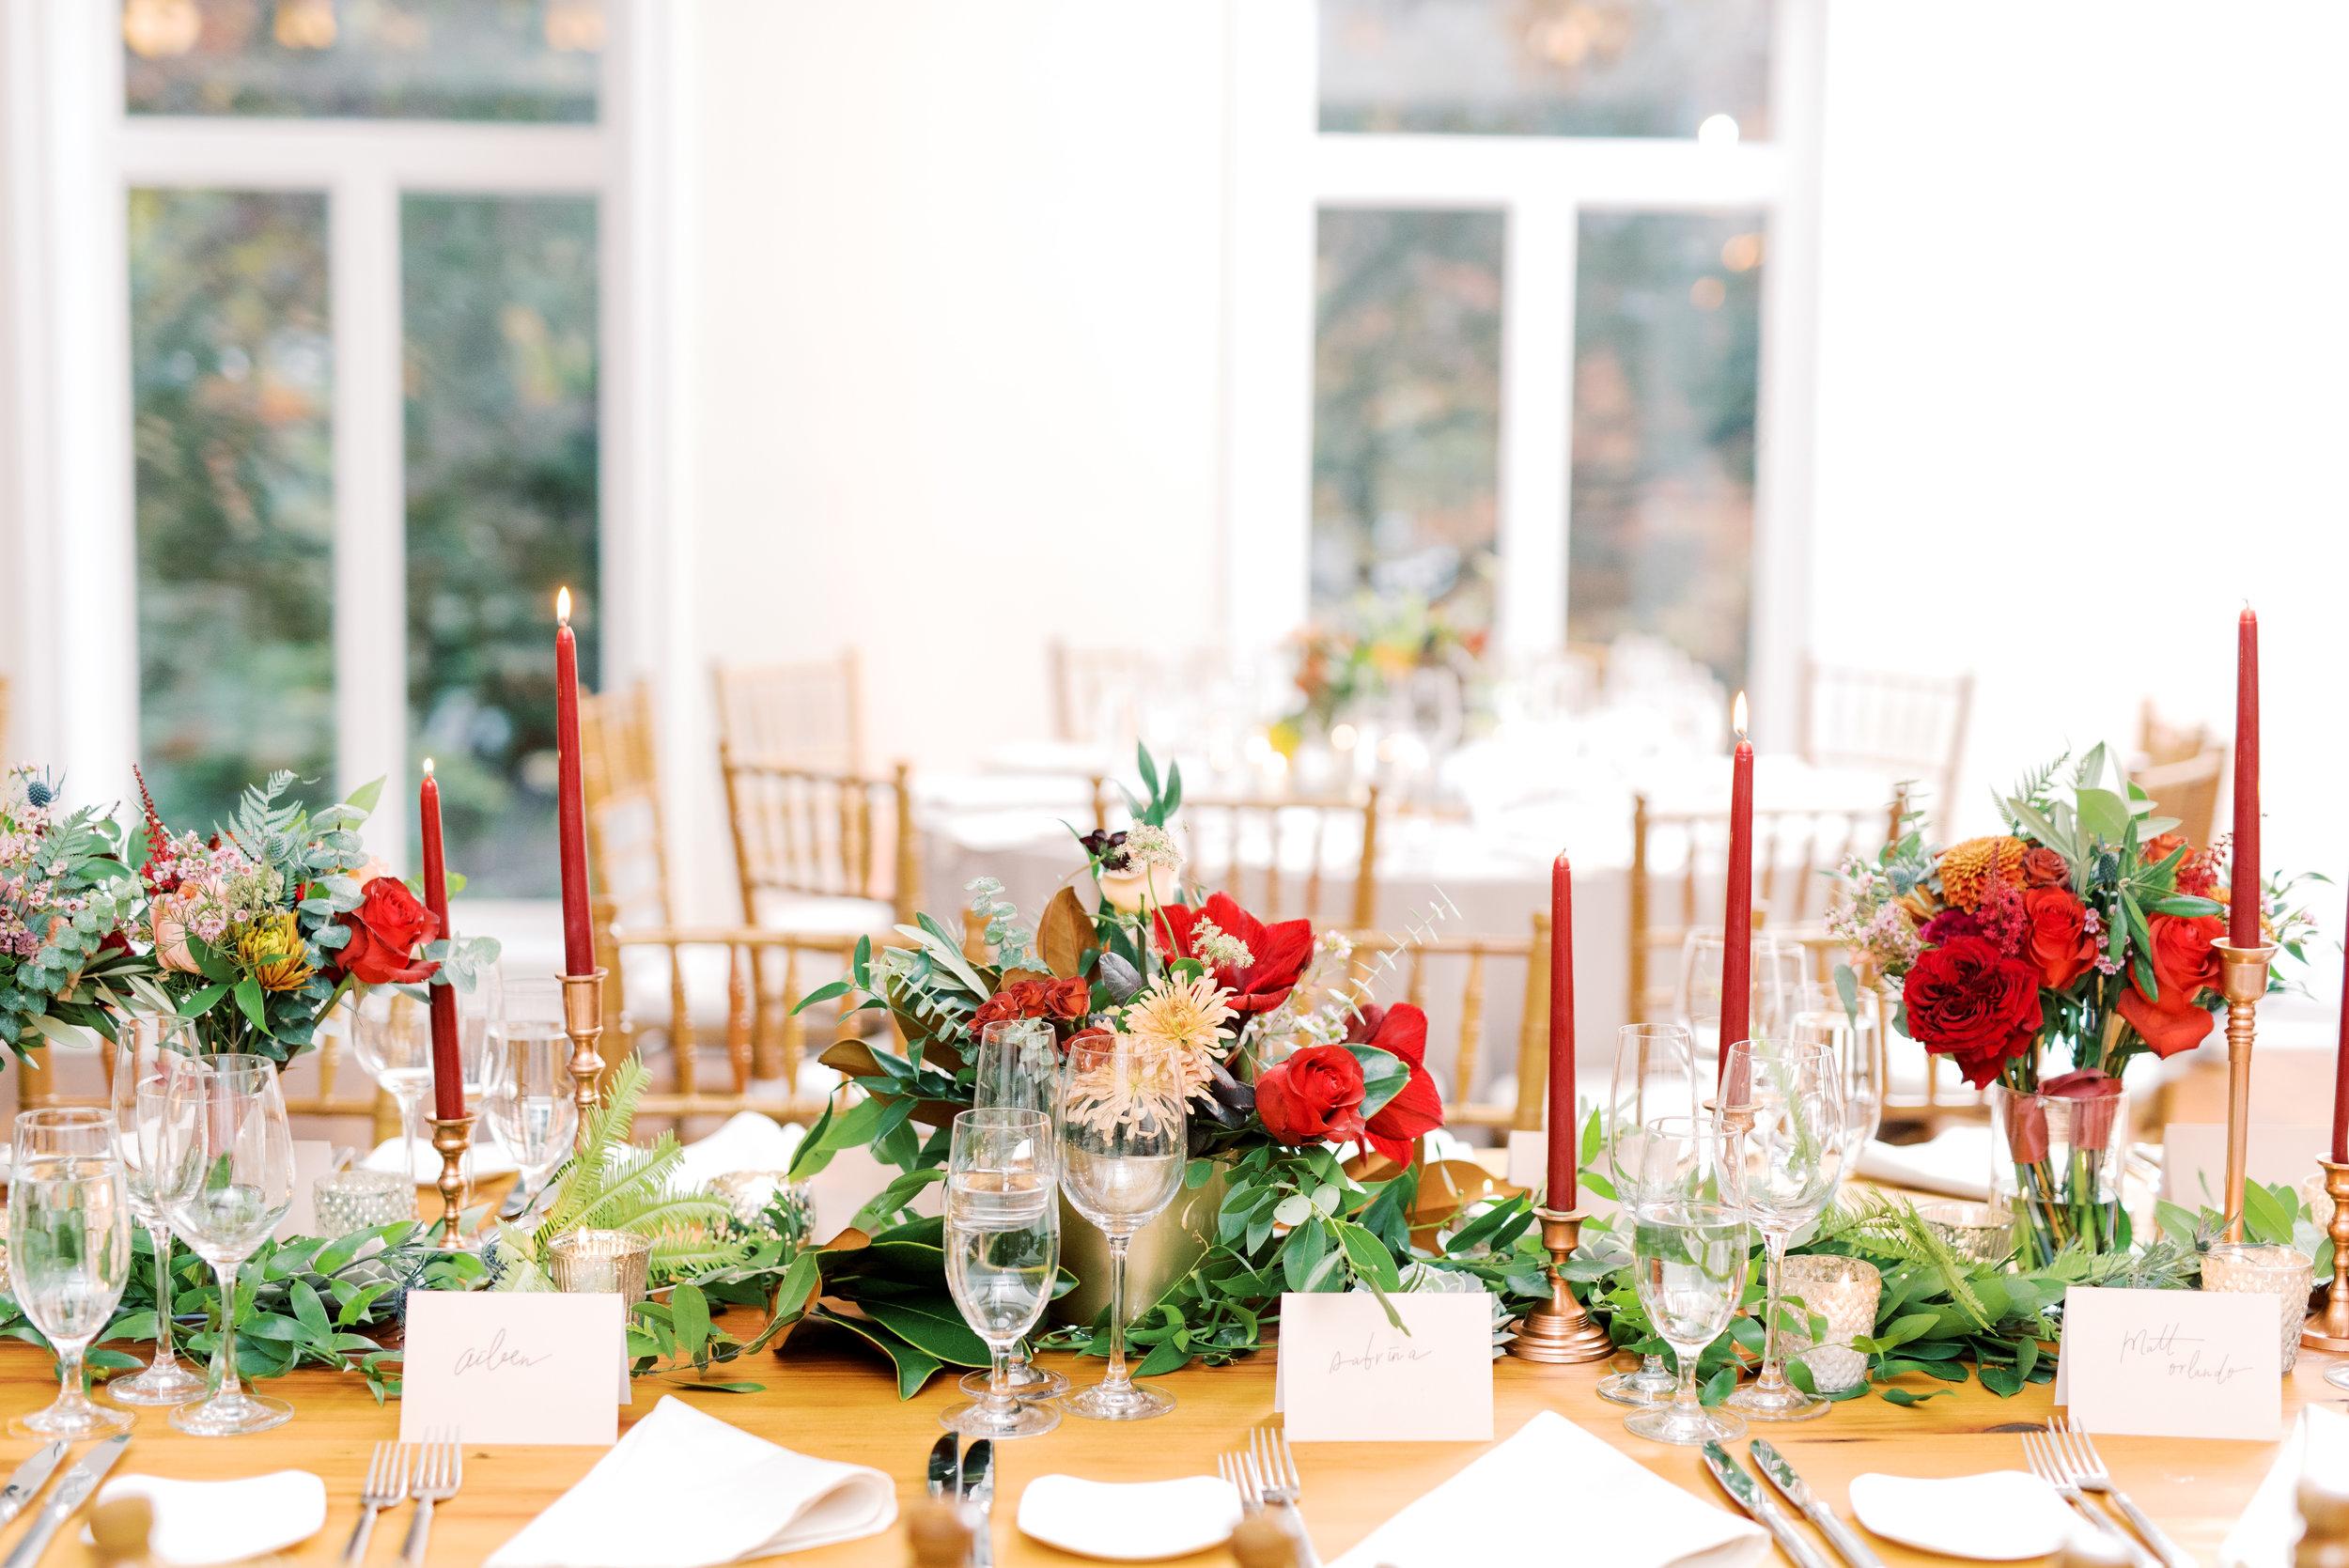 haley-richter-photography-october-pomme-wedding-in-radnor-080.jpg